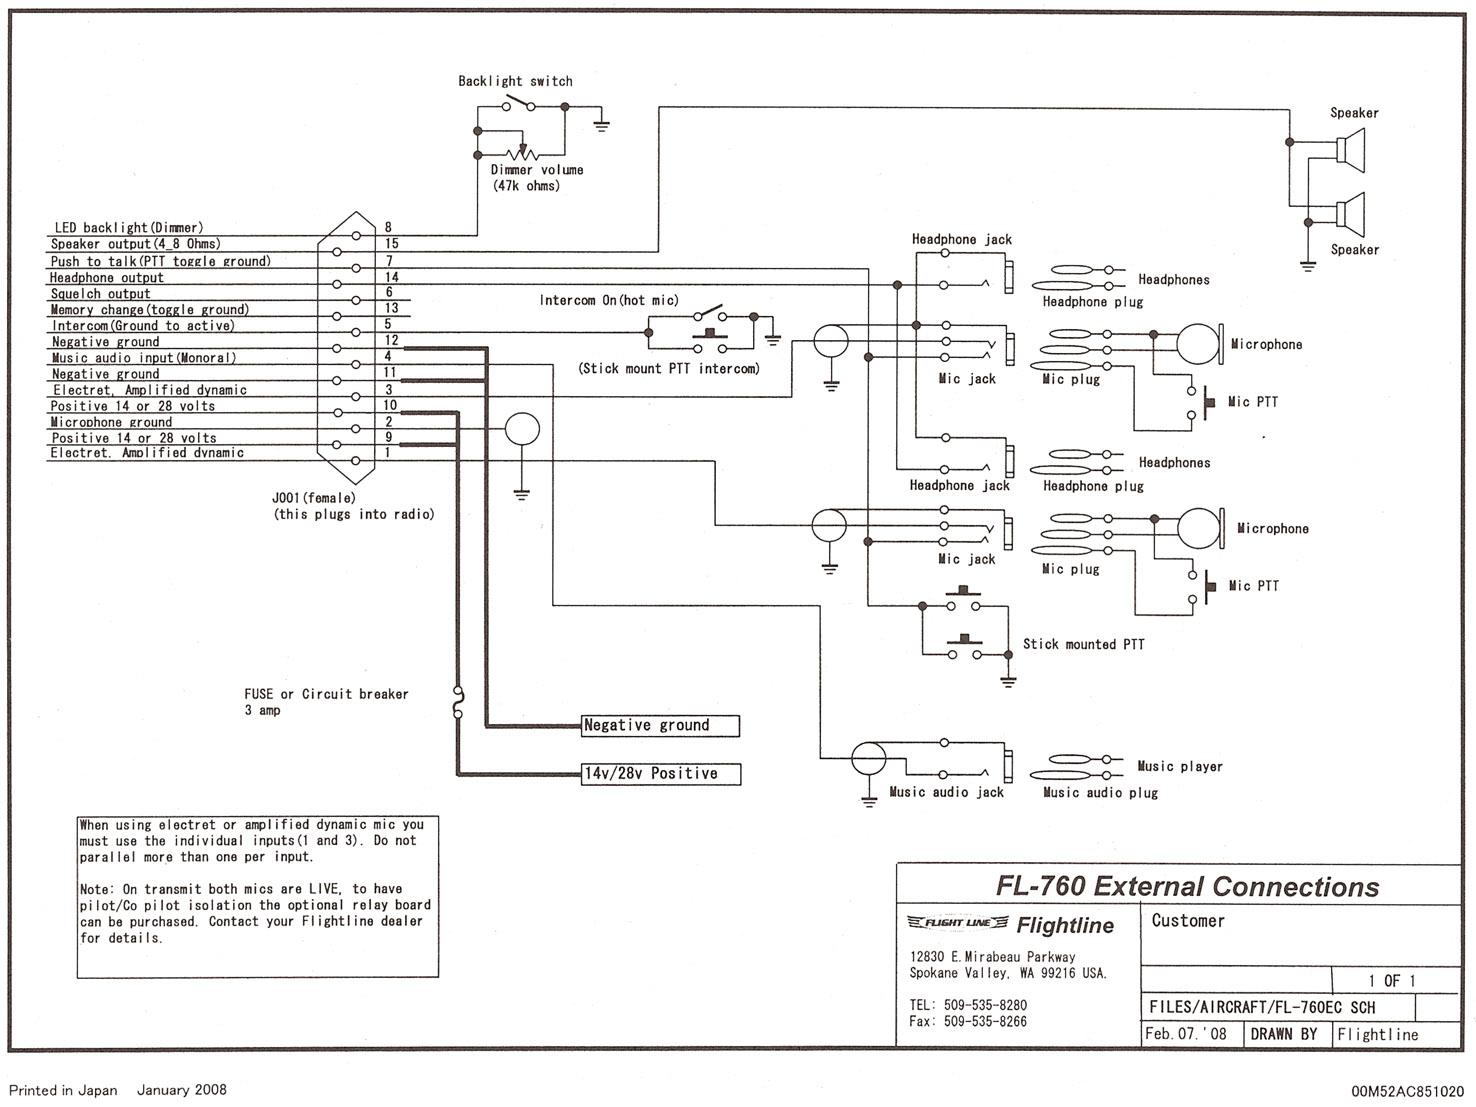 Superb Jasco 65Tdm R Alternator Wiring Diagram General Wiring Diagram Data Wiring 101 Capemaxxcnl